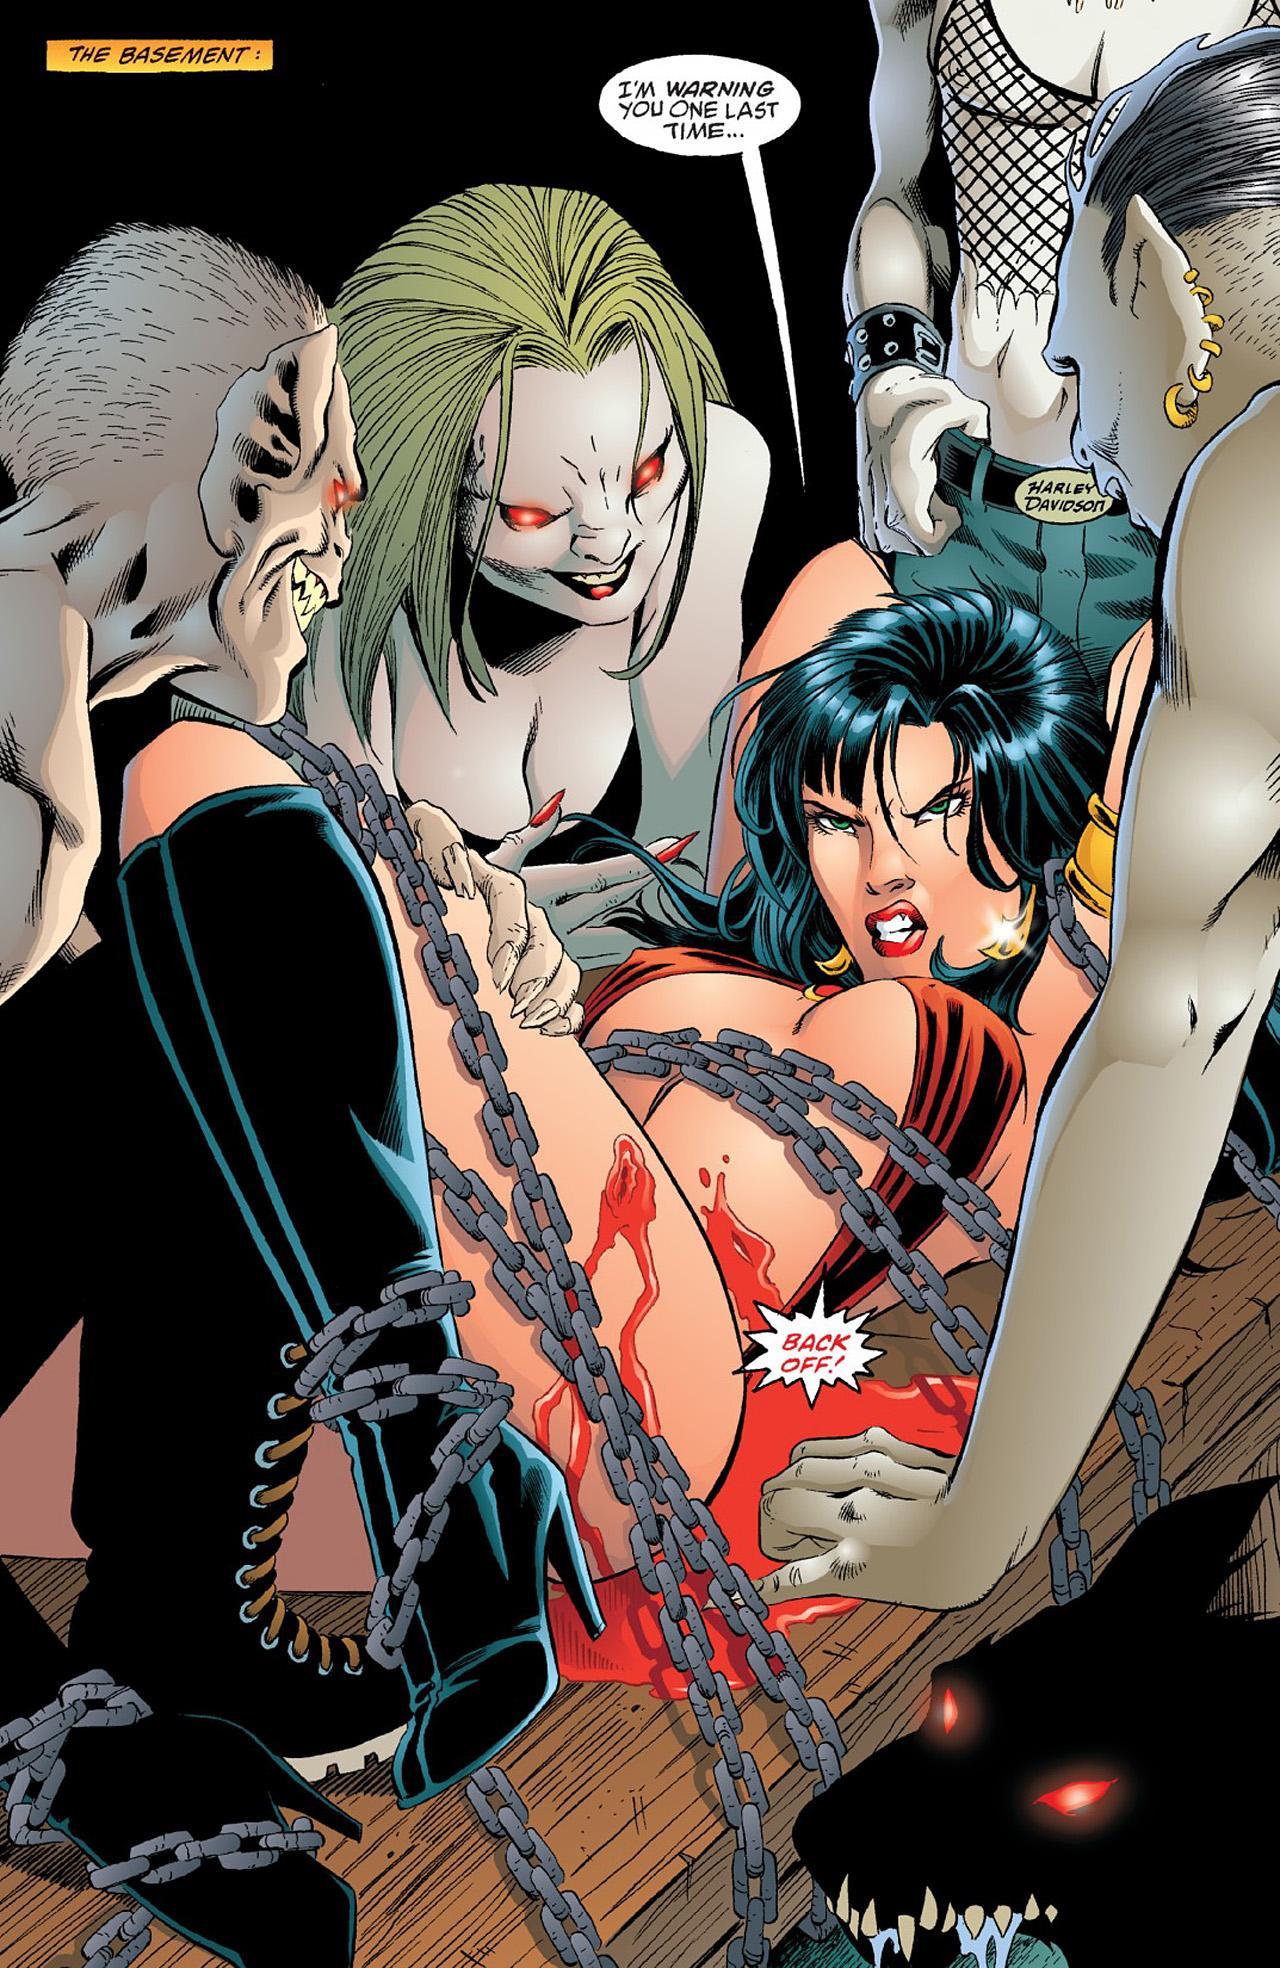 Vampirella Masters Vol 1 Morrison and Millar review